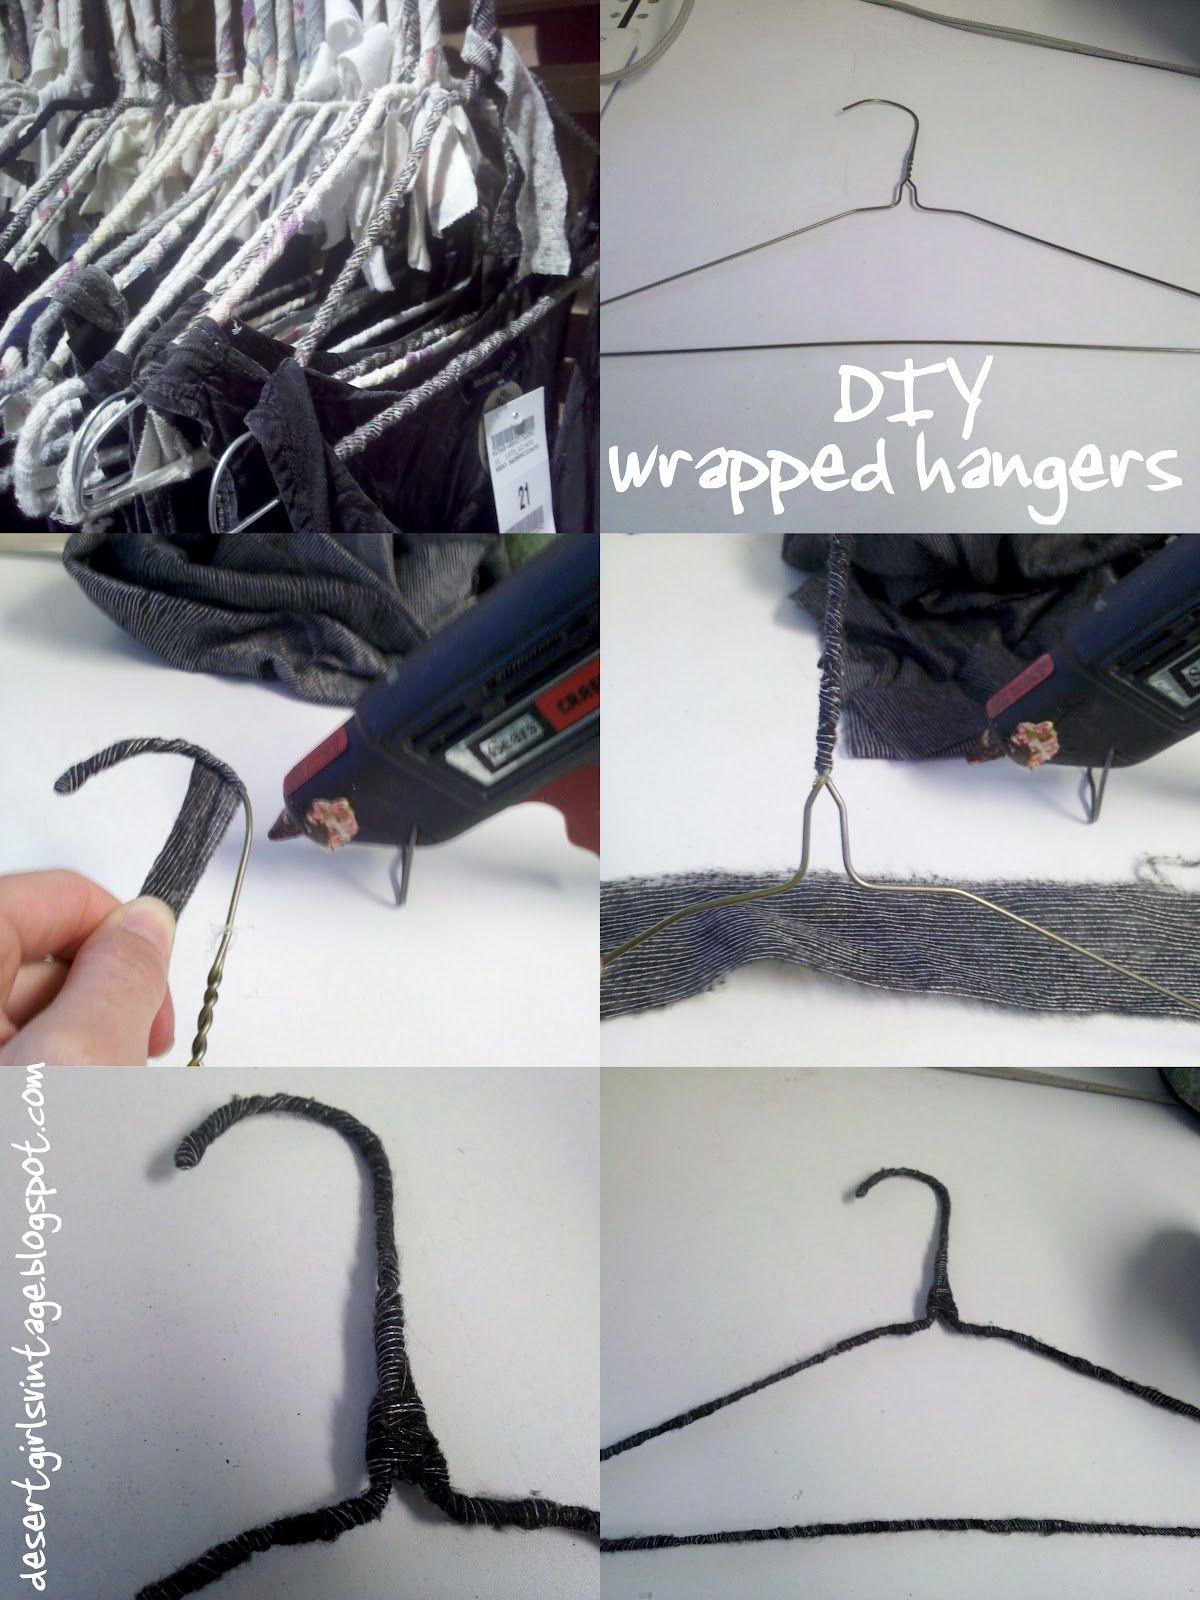 Diy Wrapped Hangers Like Brandy Melville